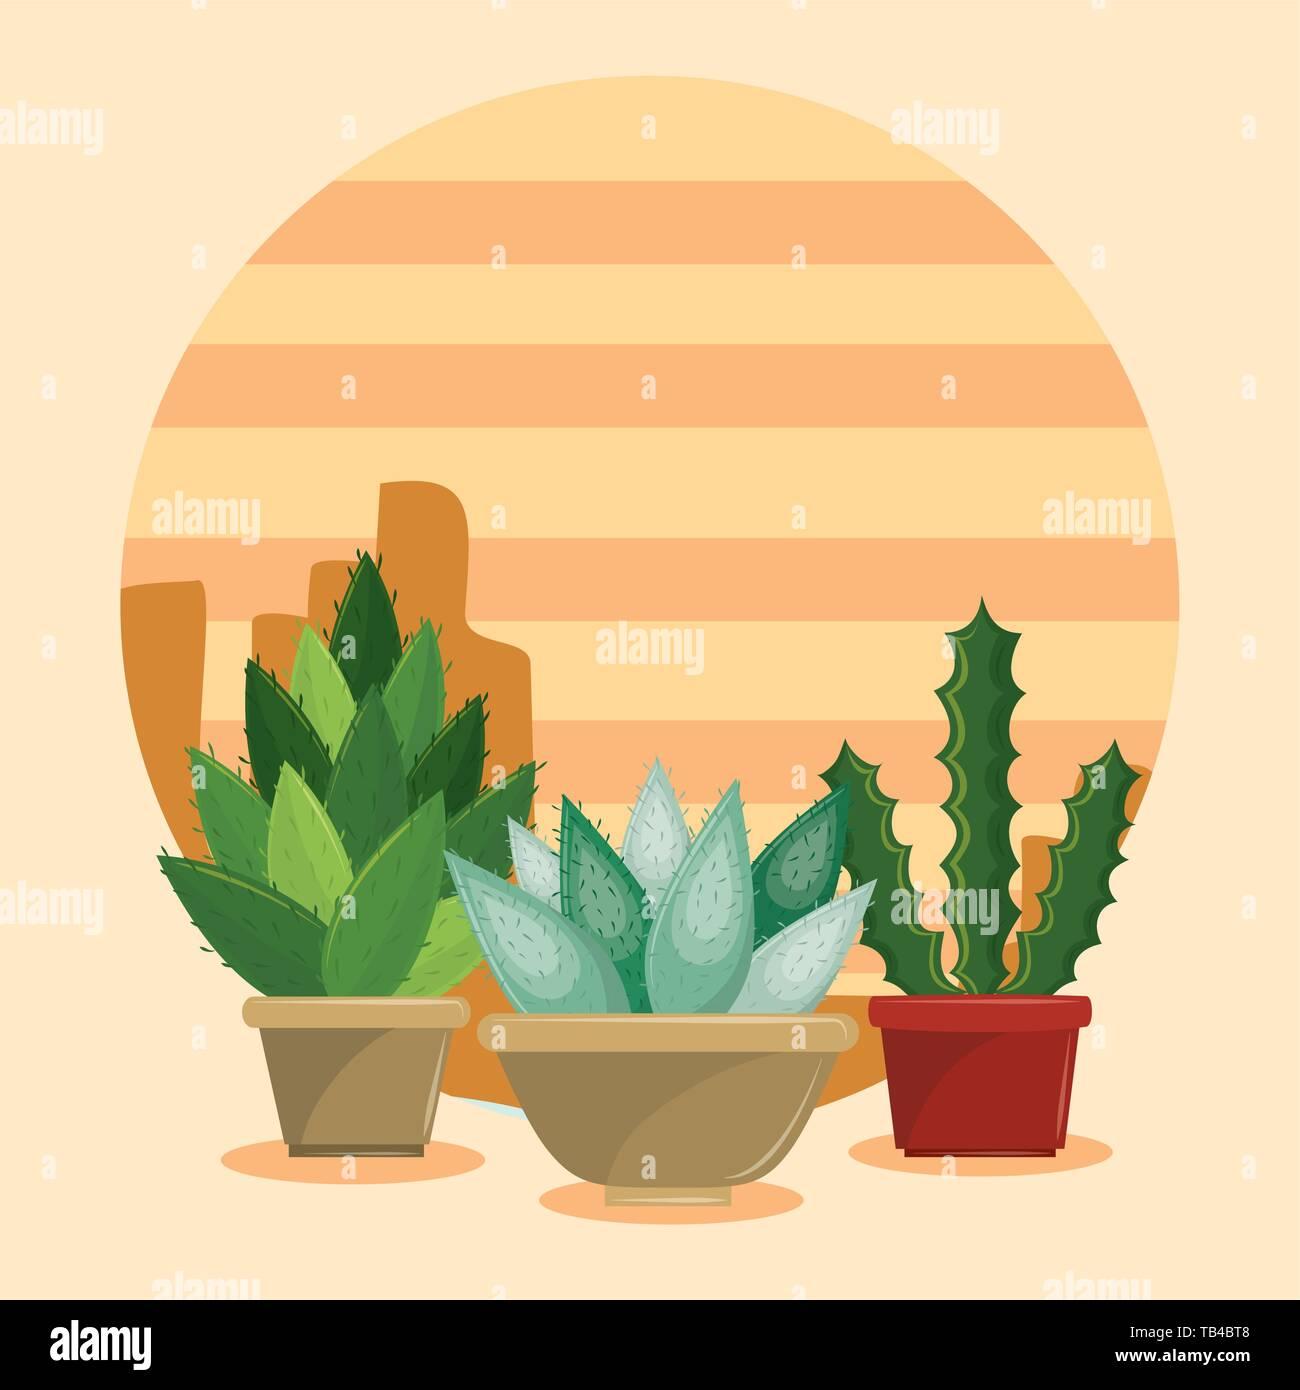 Cactus Succulents In Pot On Desertscape Stock Vector Image Art Alamy